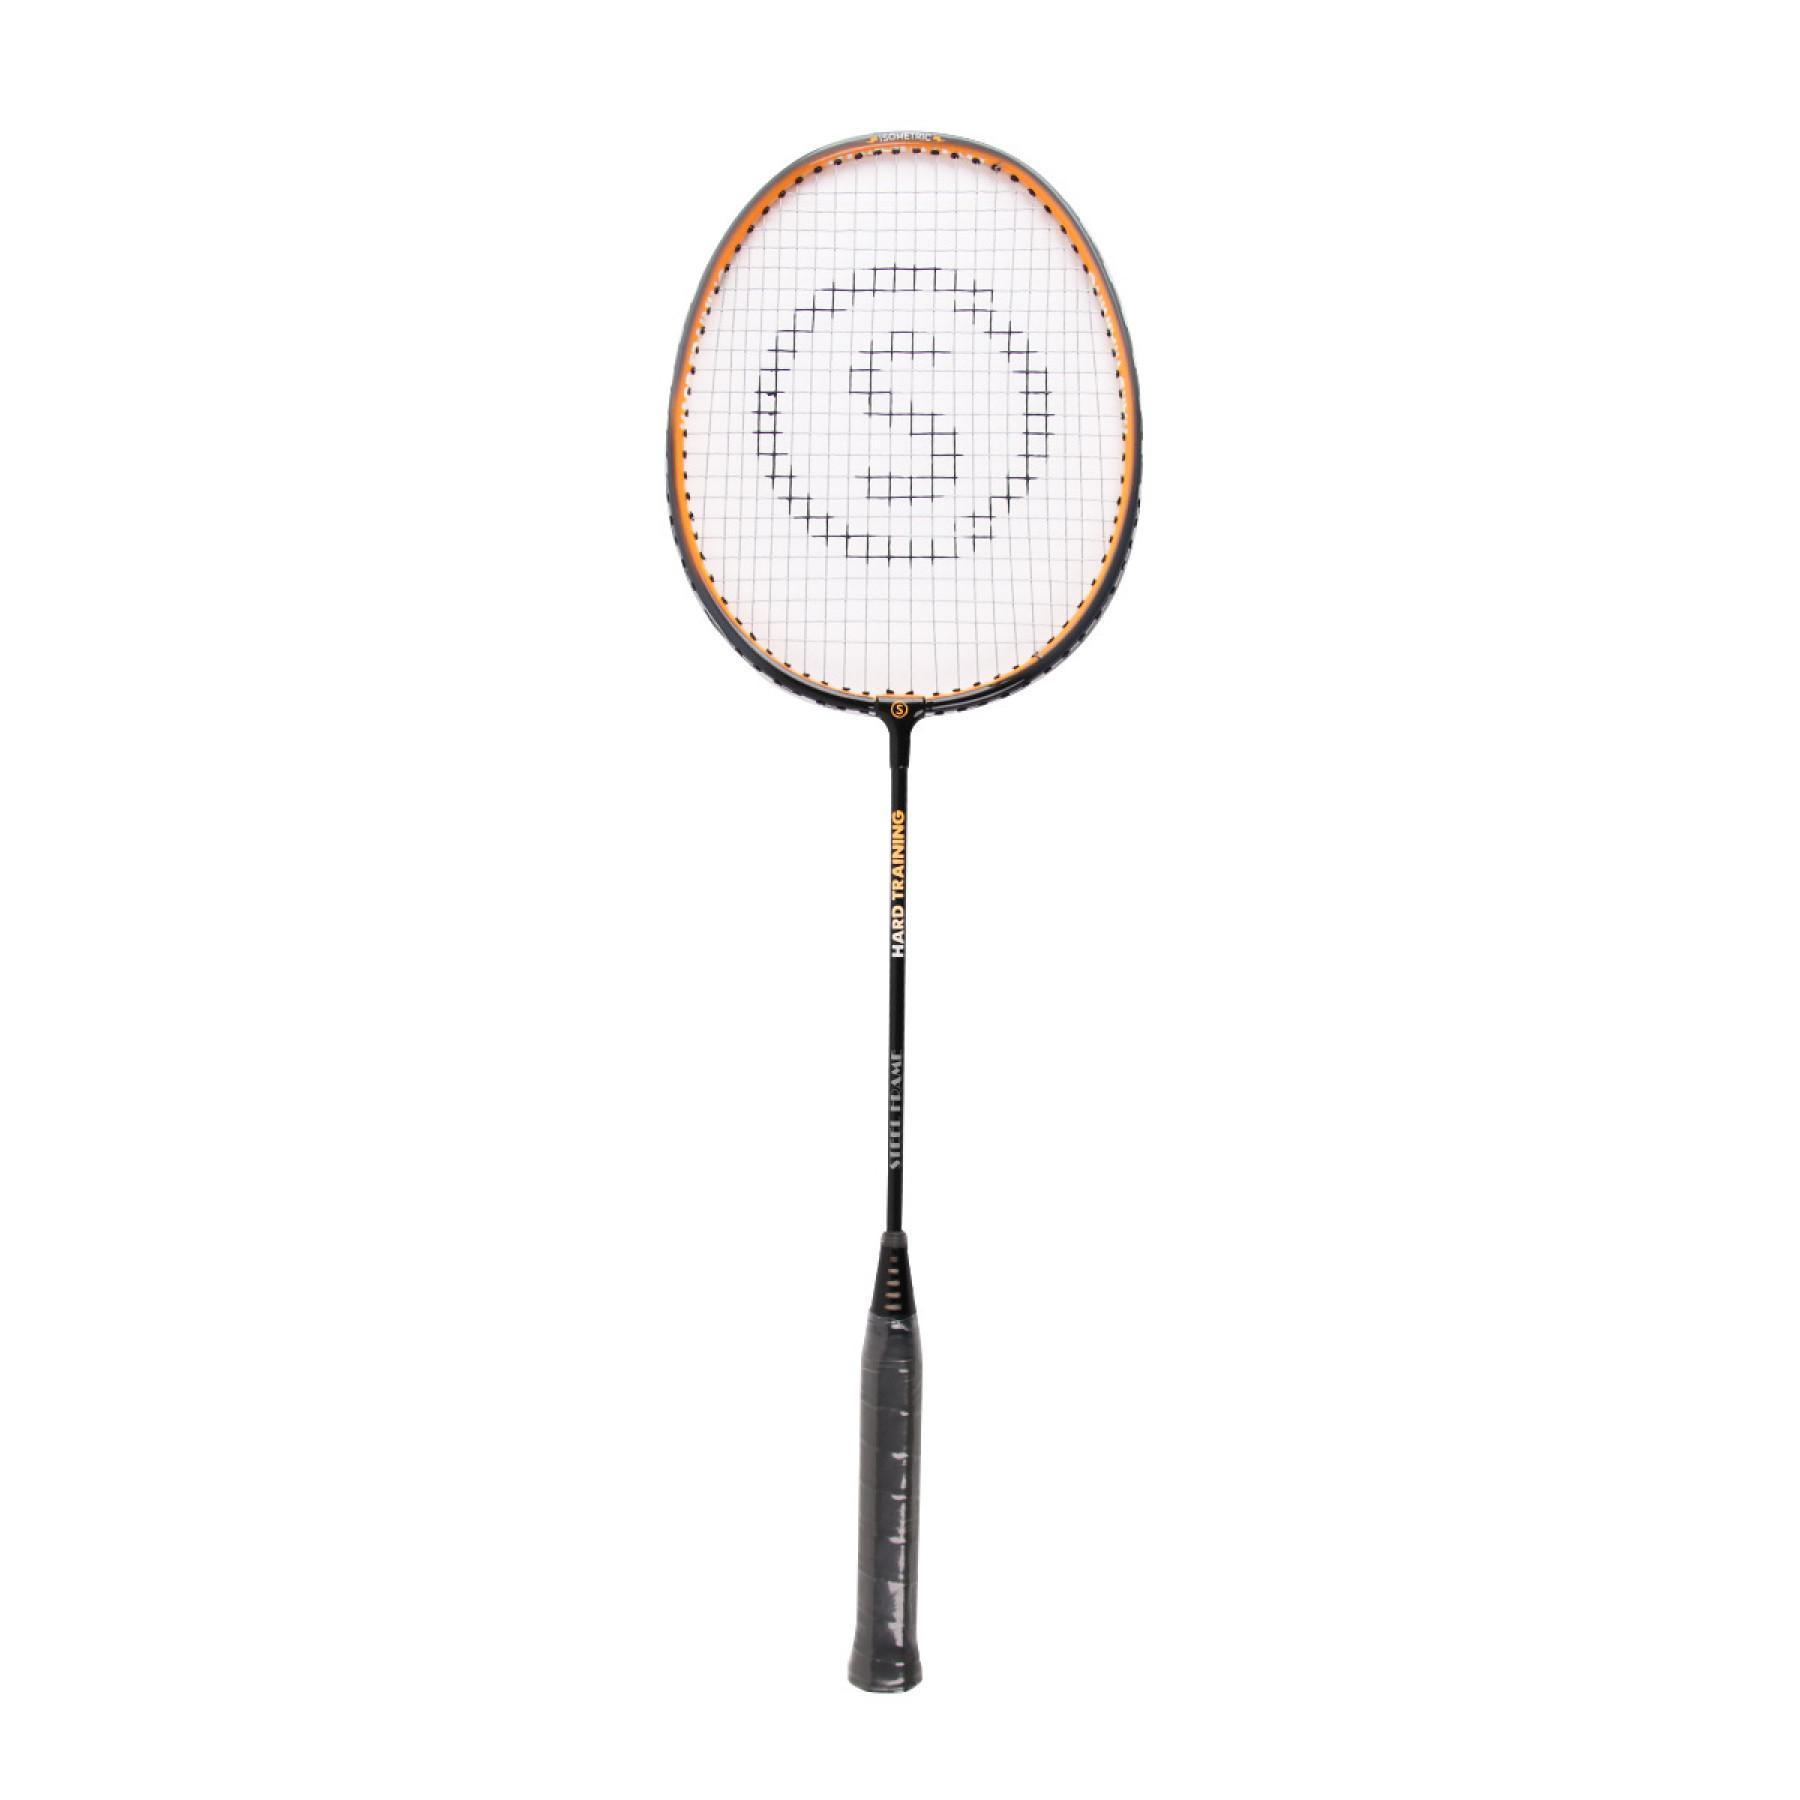 Badminton racket Sporti France Hard training